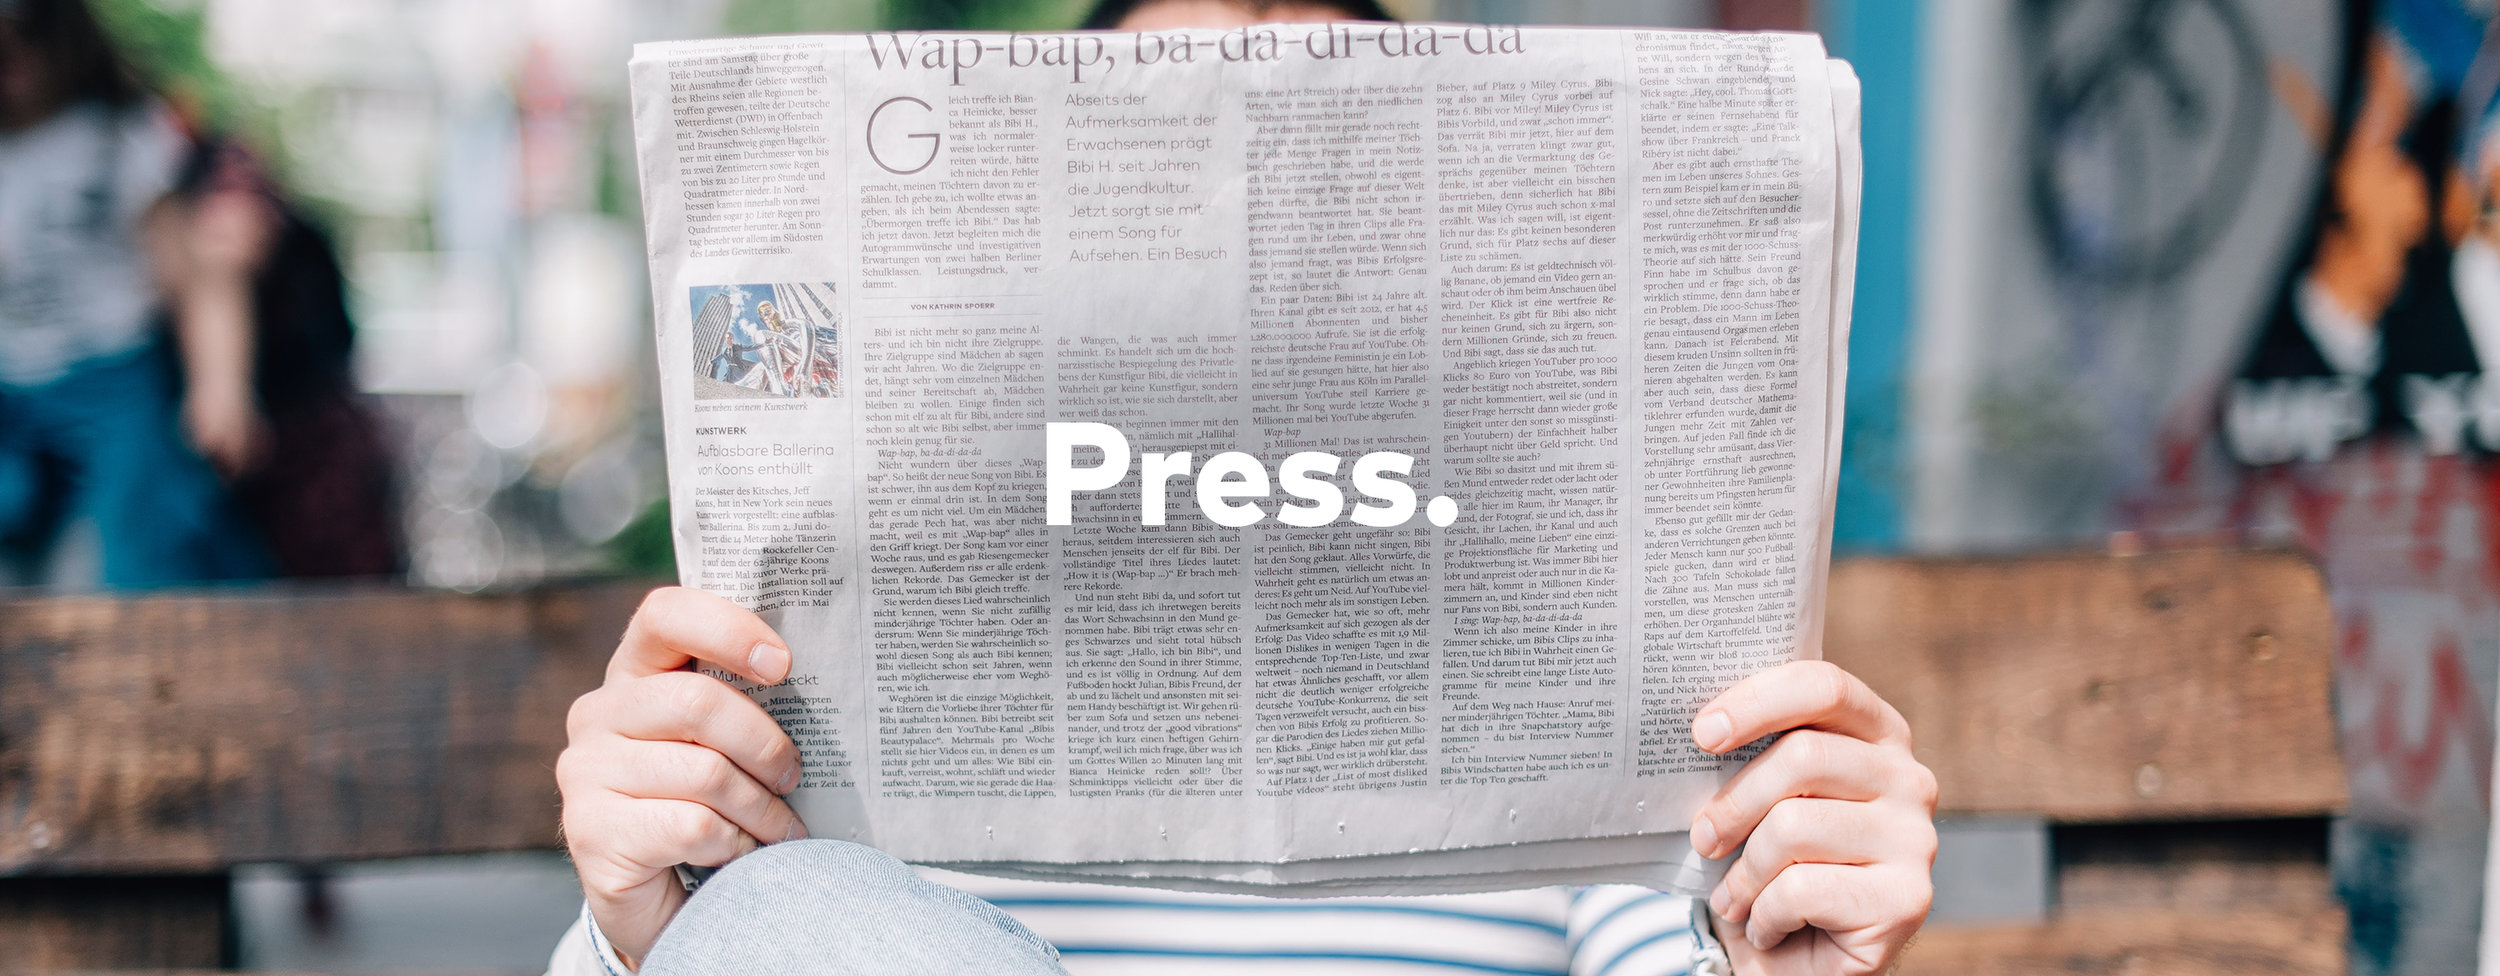 Mext_Consulting_Firm_Melbourne_Trust_HuTrust_Press_Newspaper.jpg